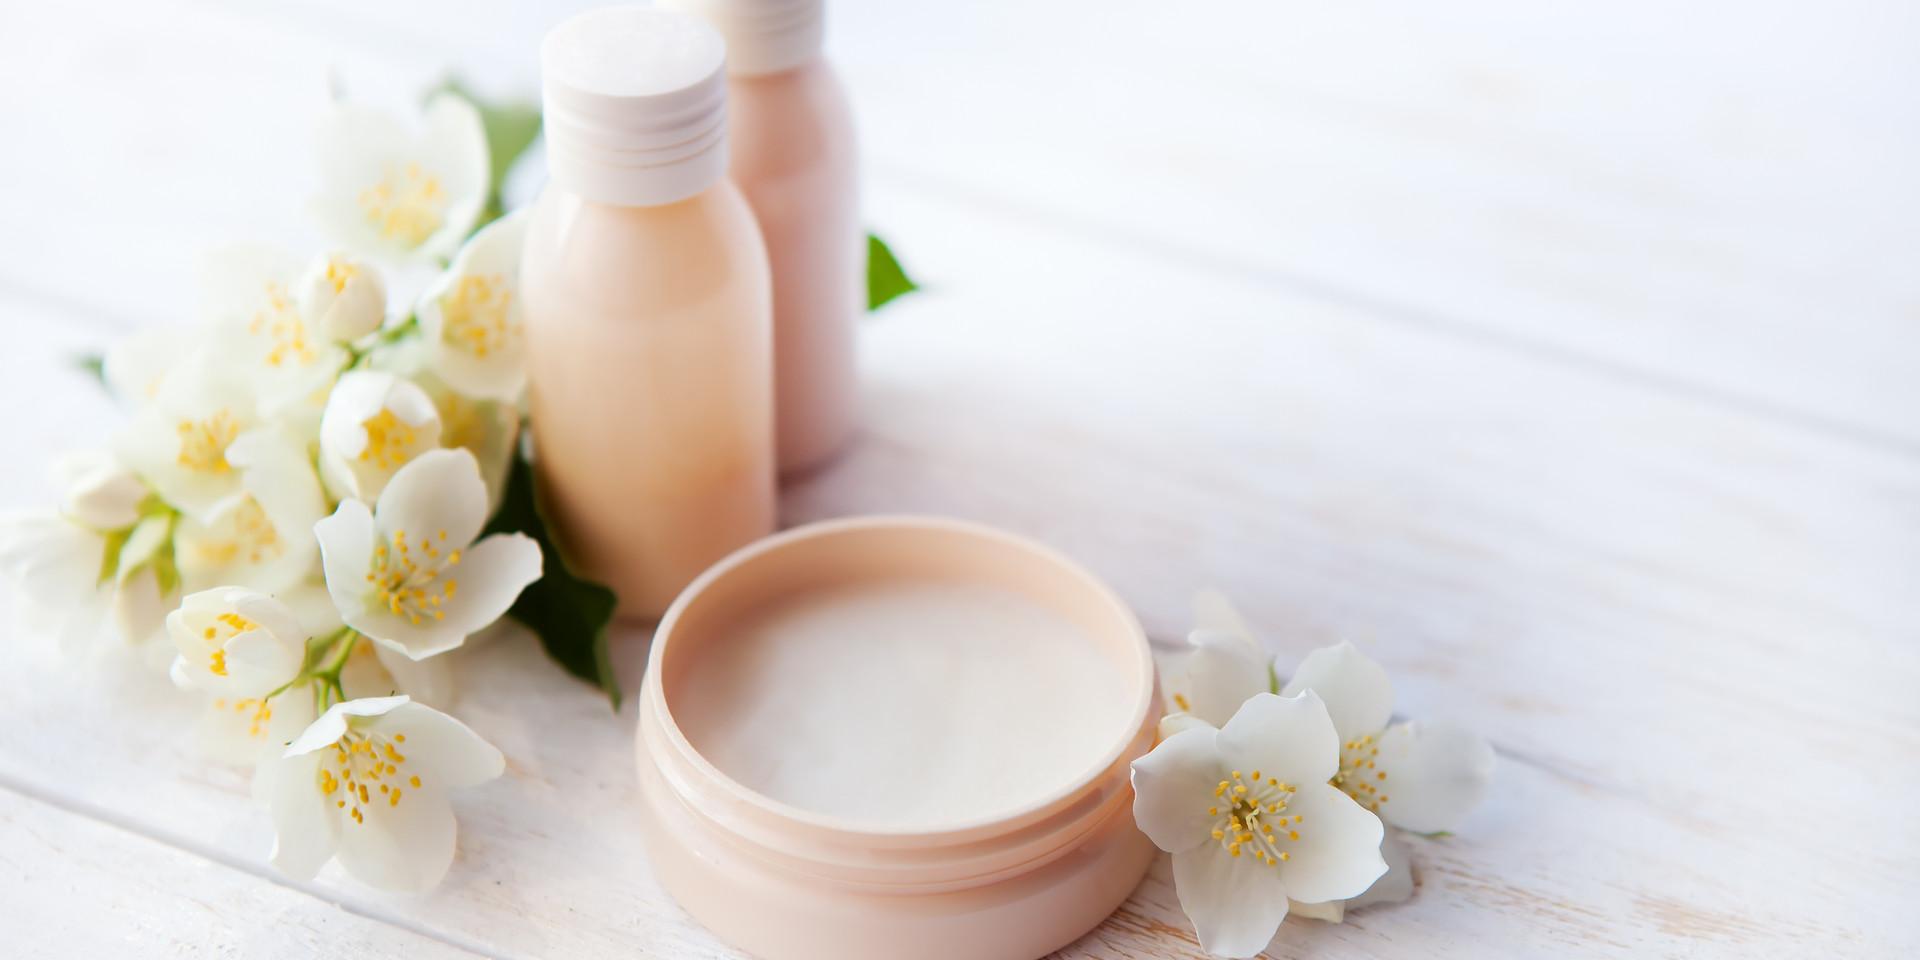 Skin care revolution